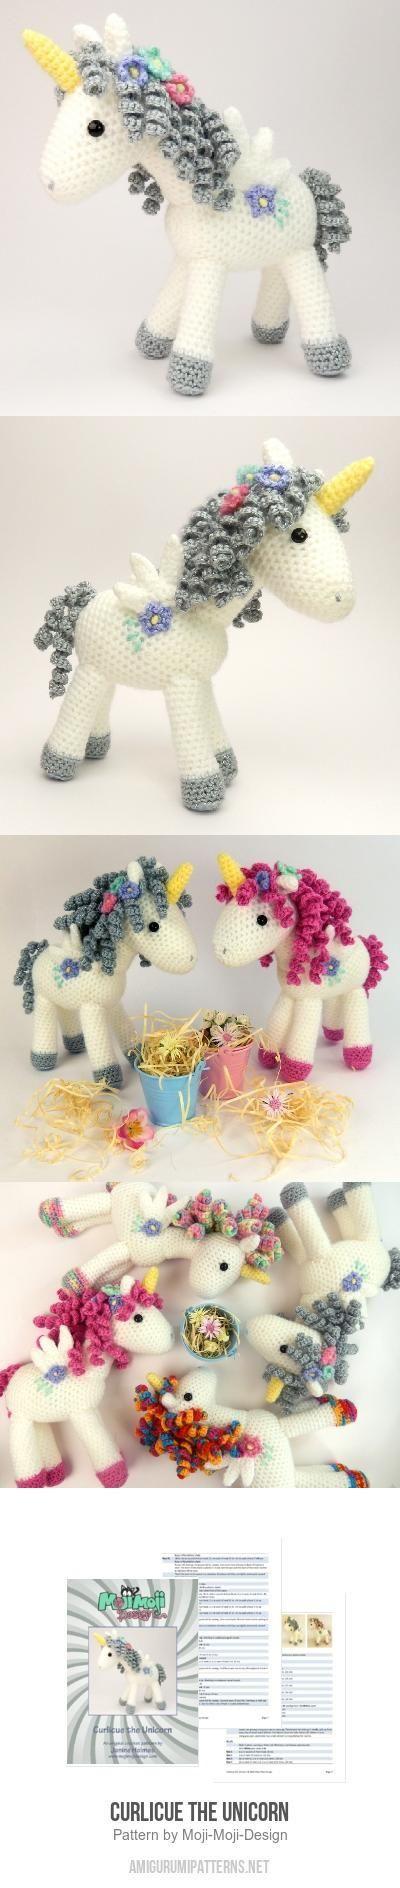 Curlicue The Unicorn Amigurumi Pattern - so adorable! | häkeln/Hasen ...